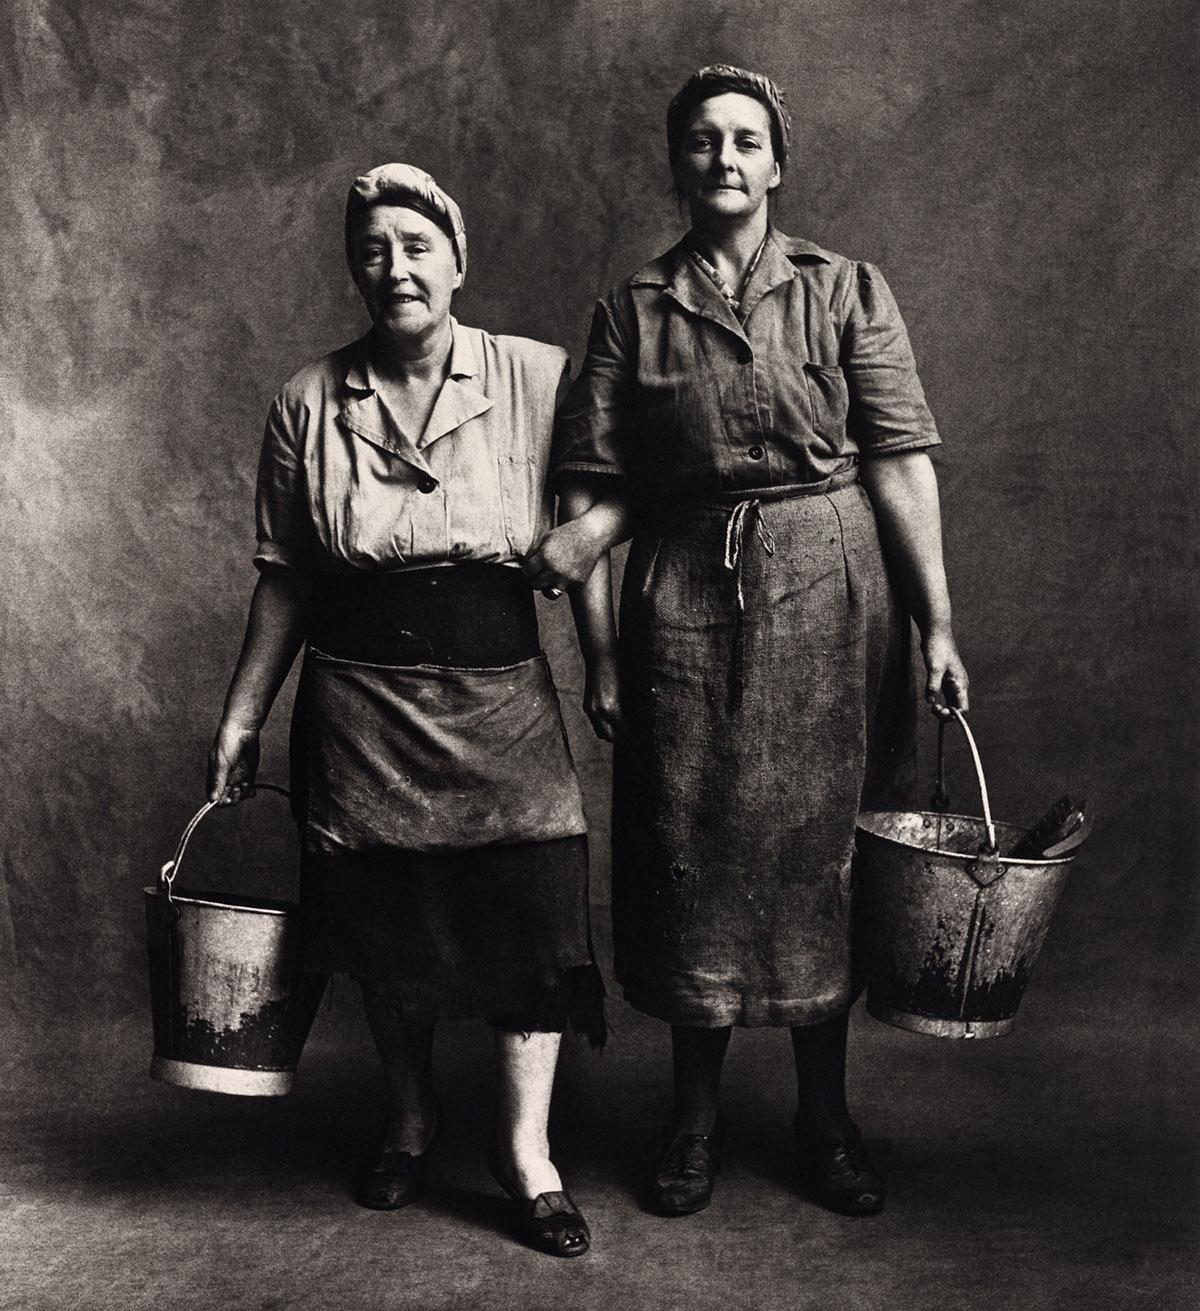 charwomen_london_1950